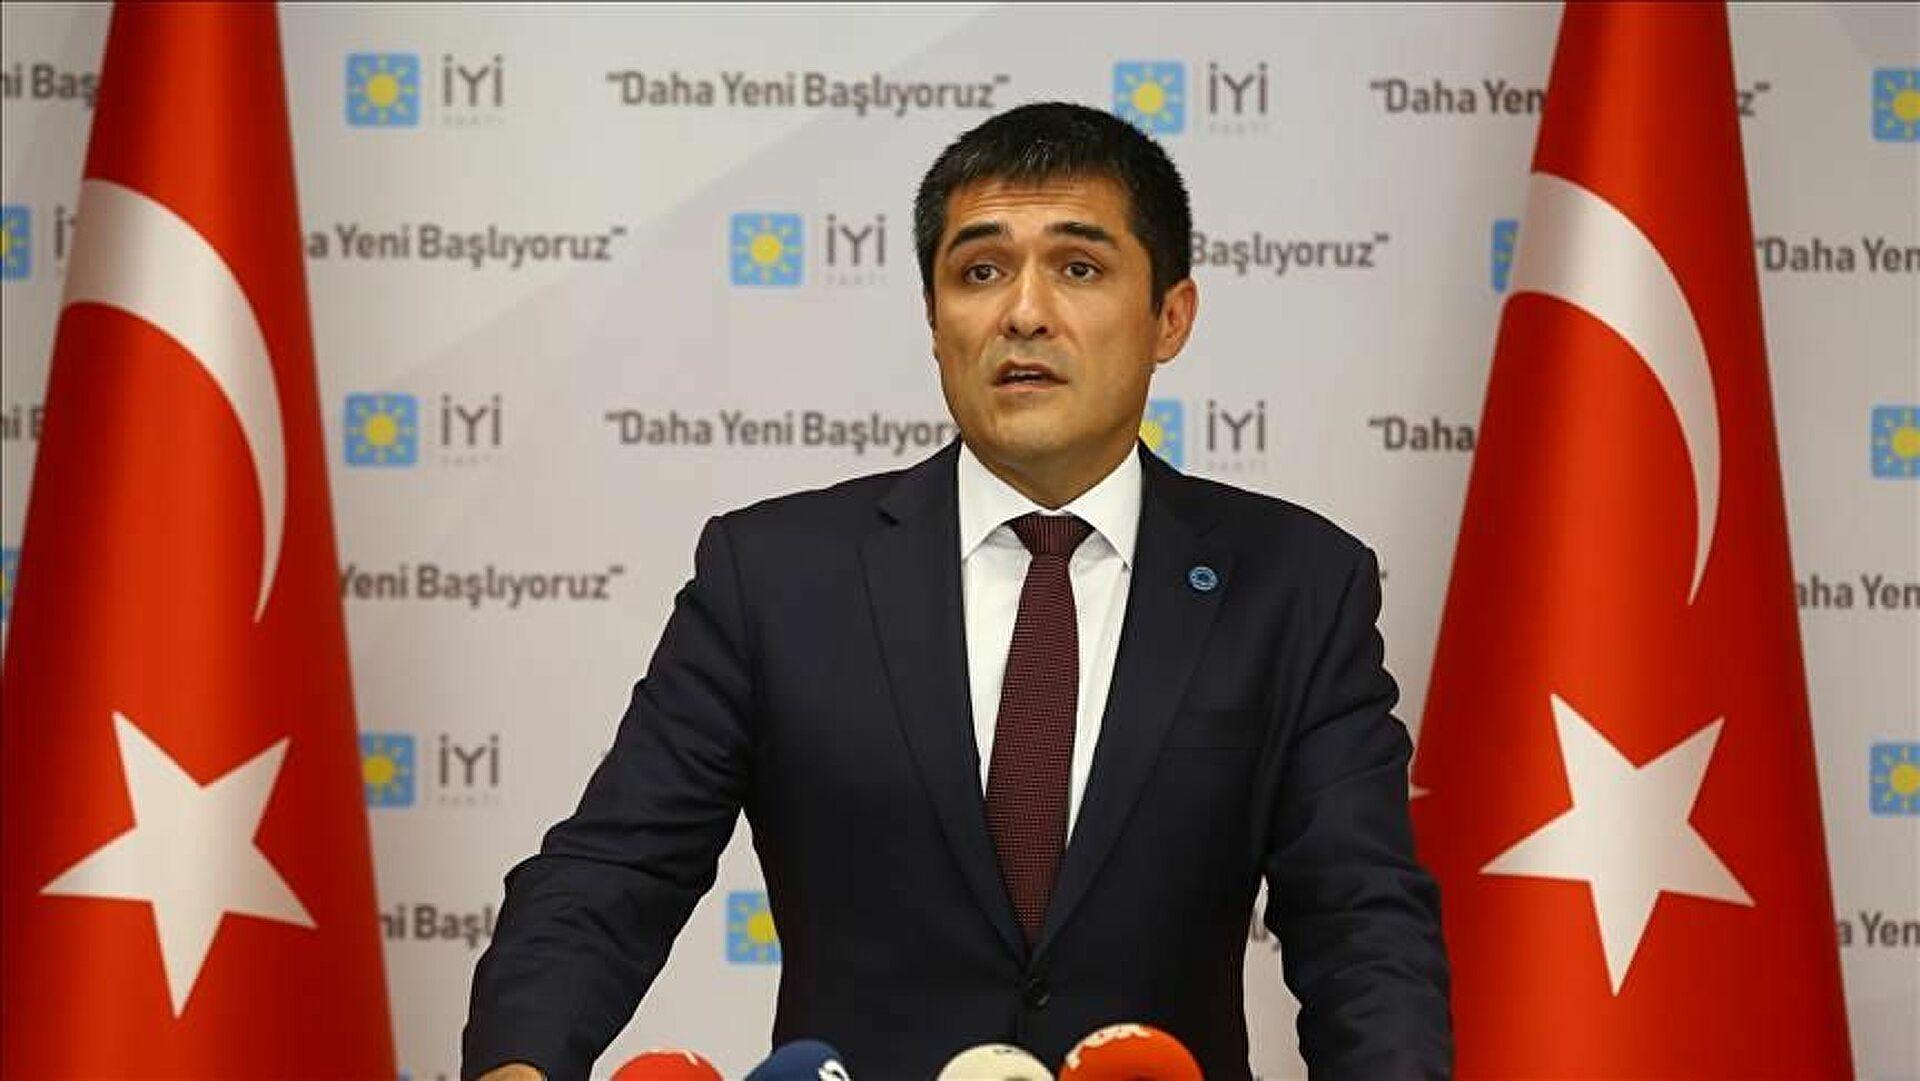 İYİP İstanbul İl Başkanı'na saldıran kişi tahliye edildi